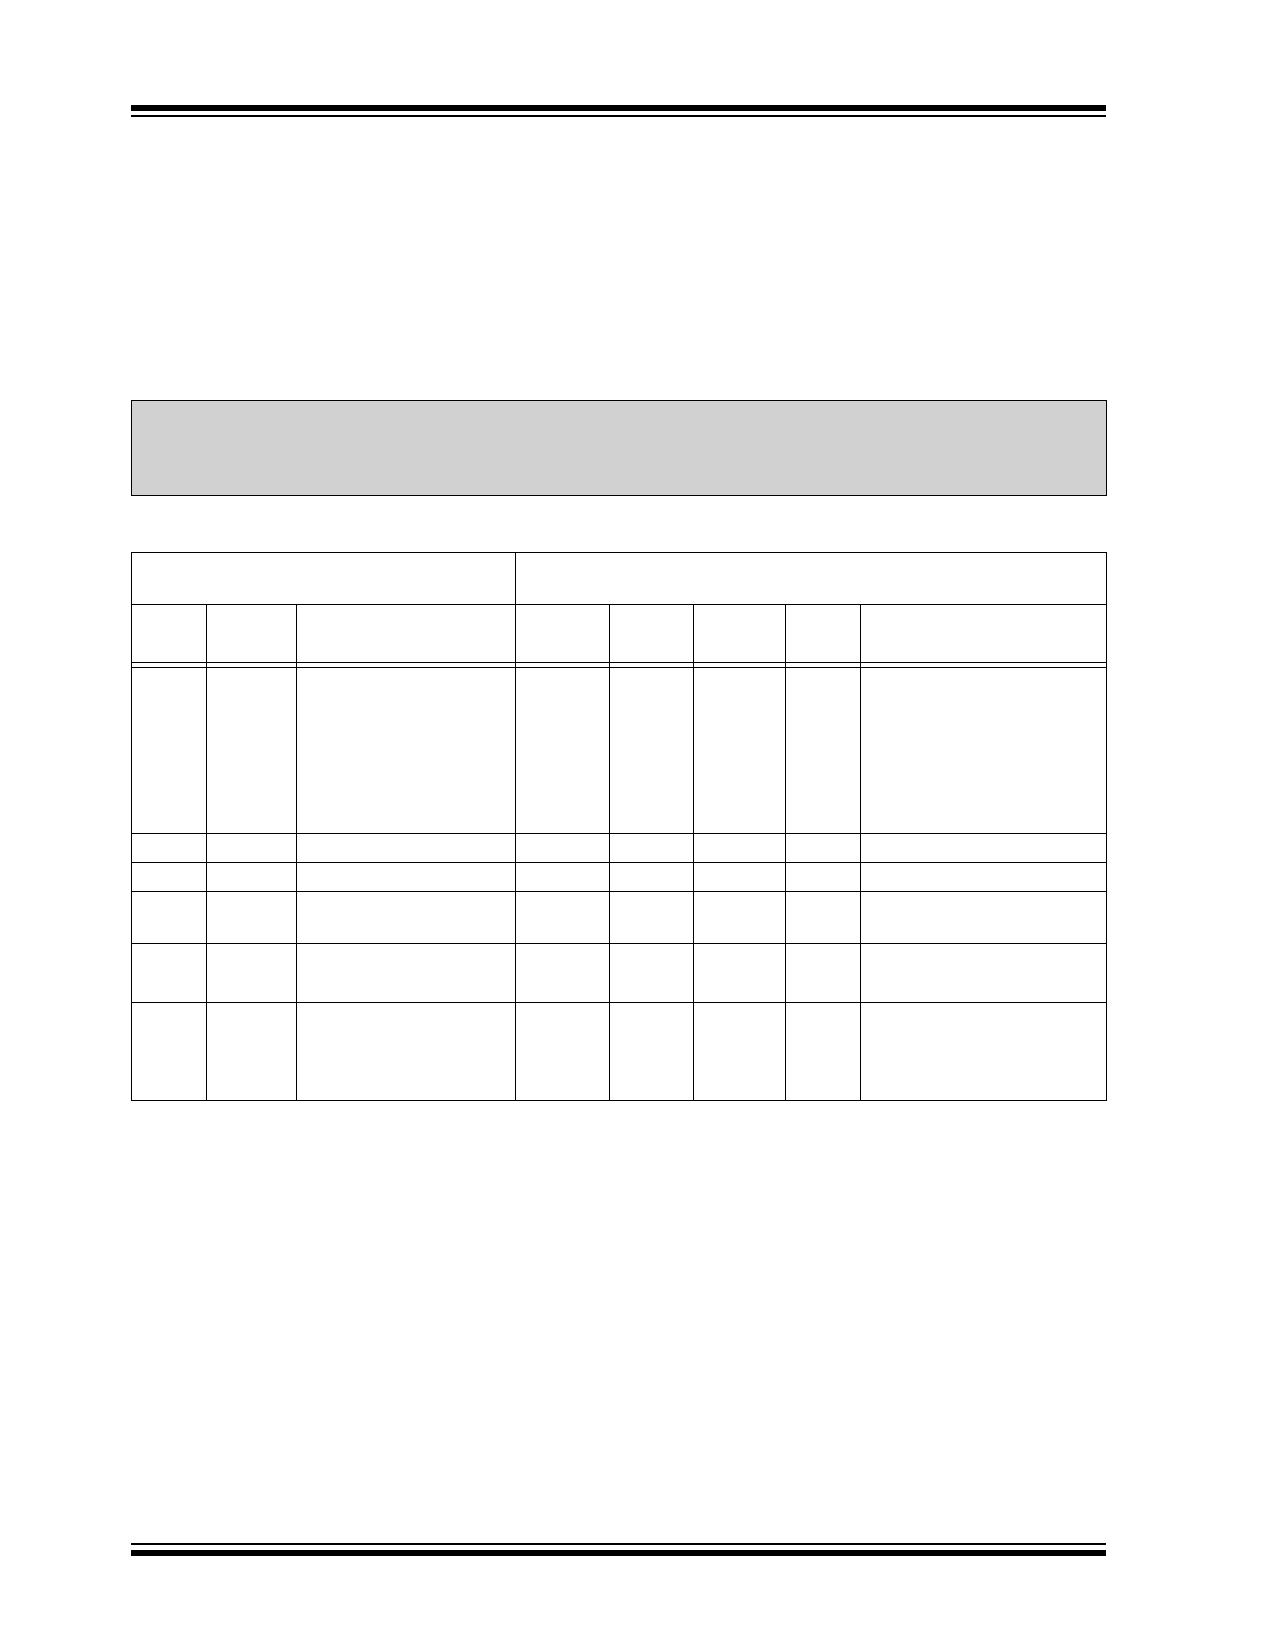 24AA02 pdf, schematic